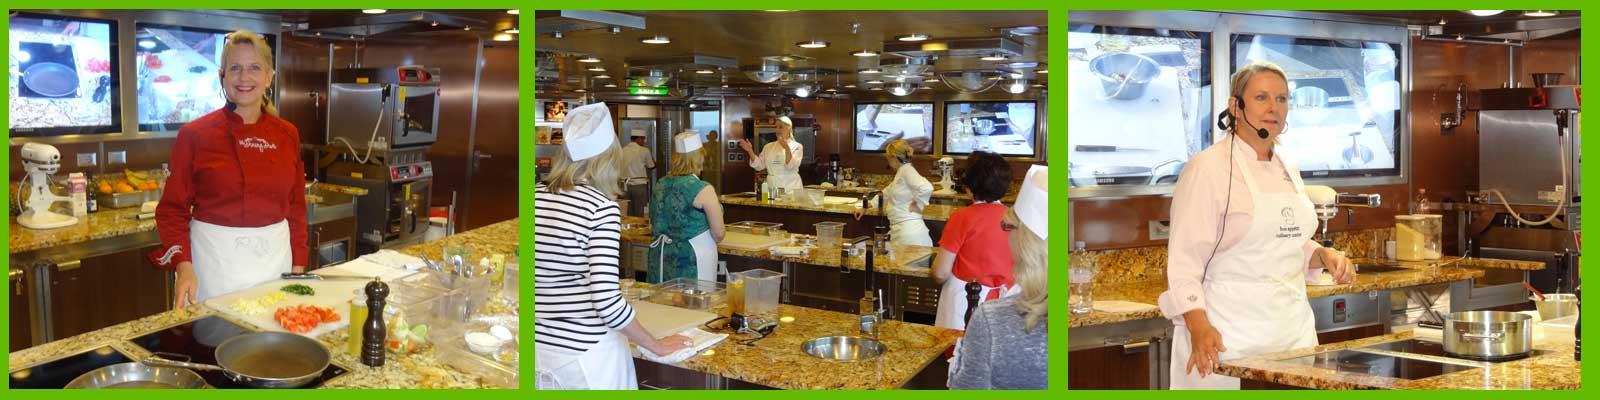 culinary-instructor